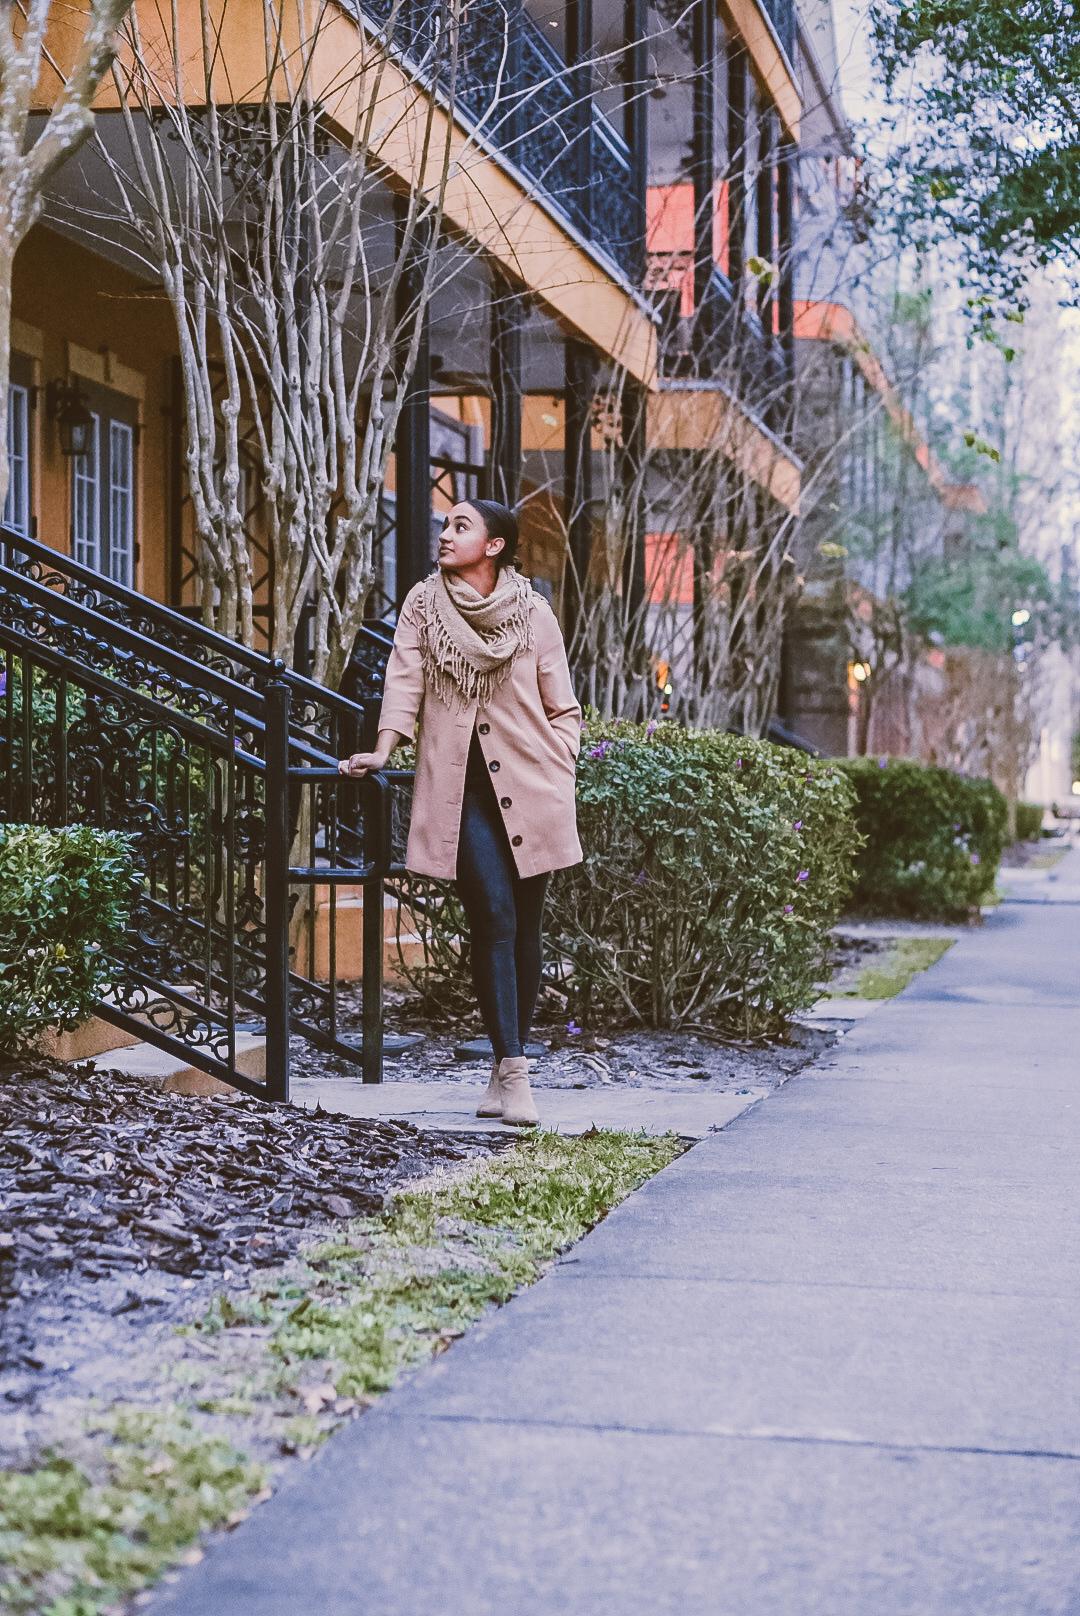 5 Ideas for a Budget-Friendly Valentine's Day- Monique McHugh Blog